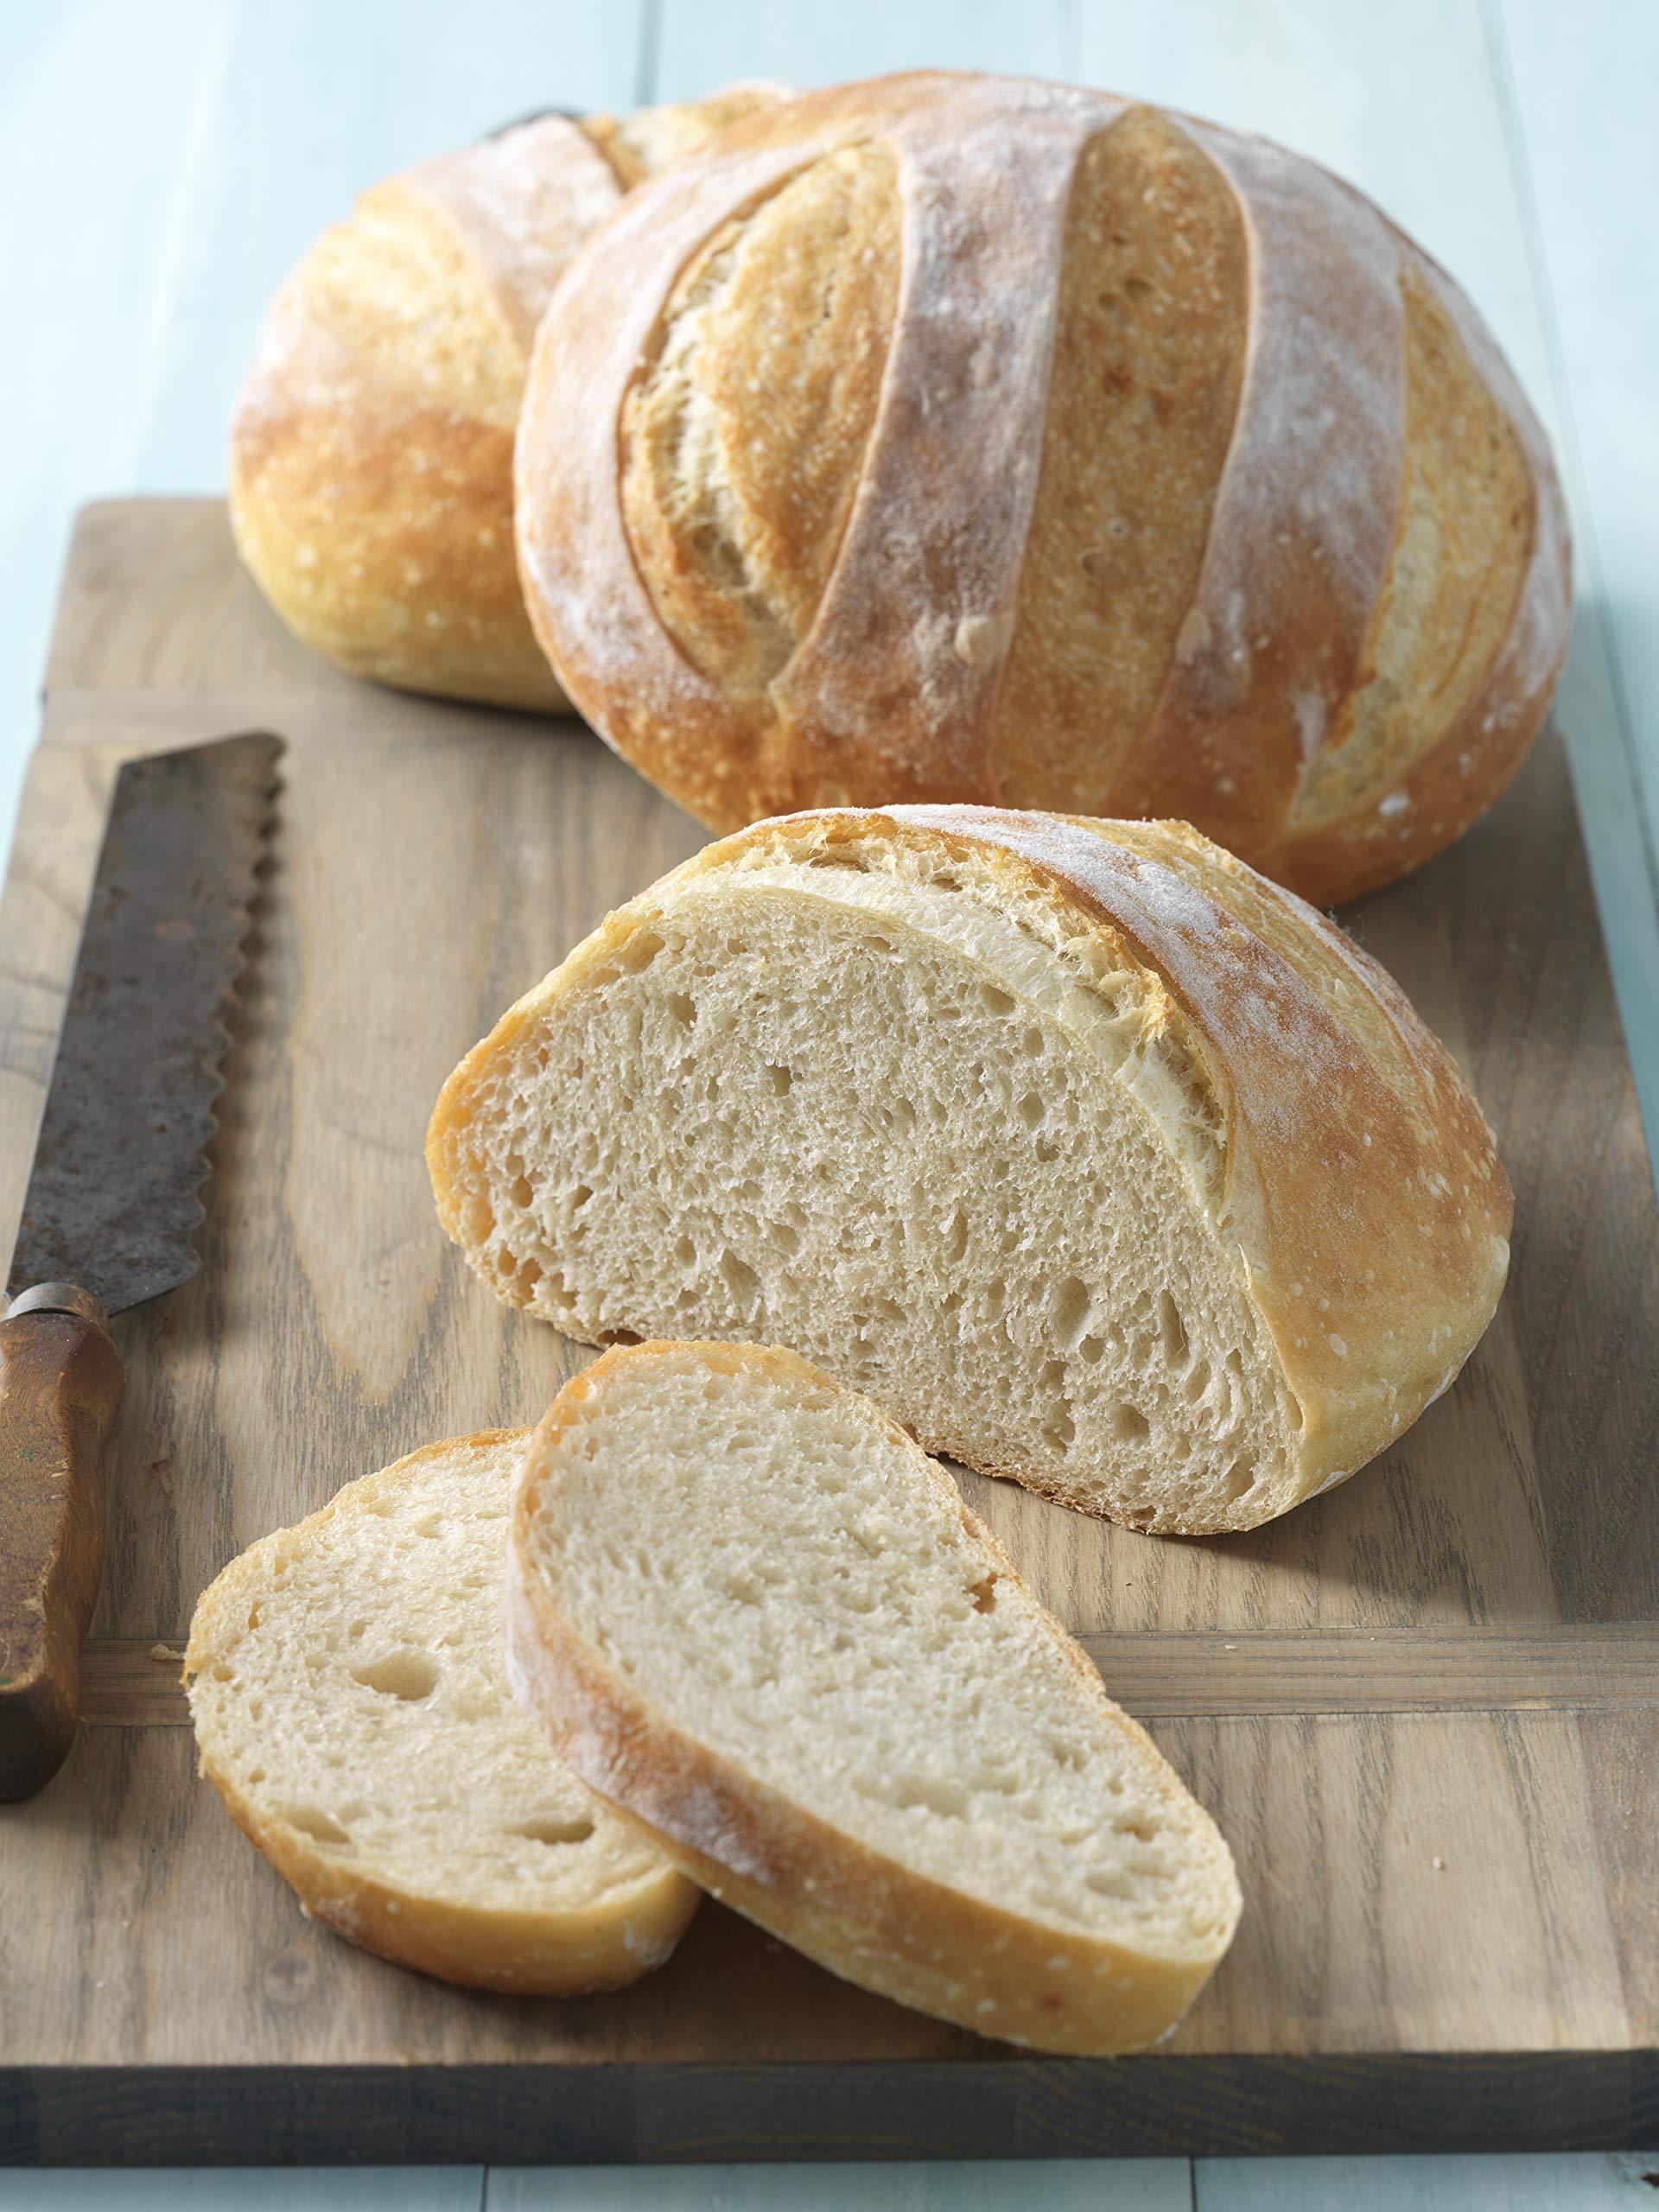 King Arthur Flour 100% Organic All-Purpose Flour, Unbleached, 2 Pound (Pack of 12) by King Arthur Flour (Image #5)